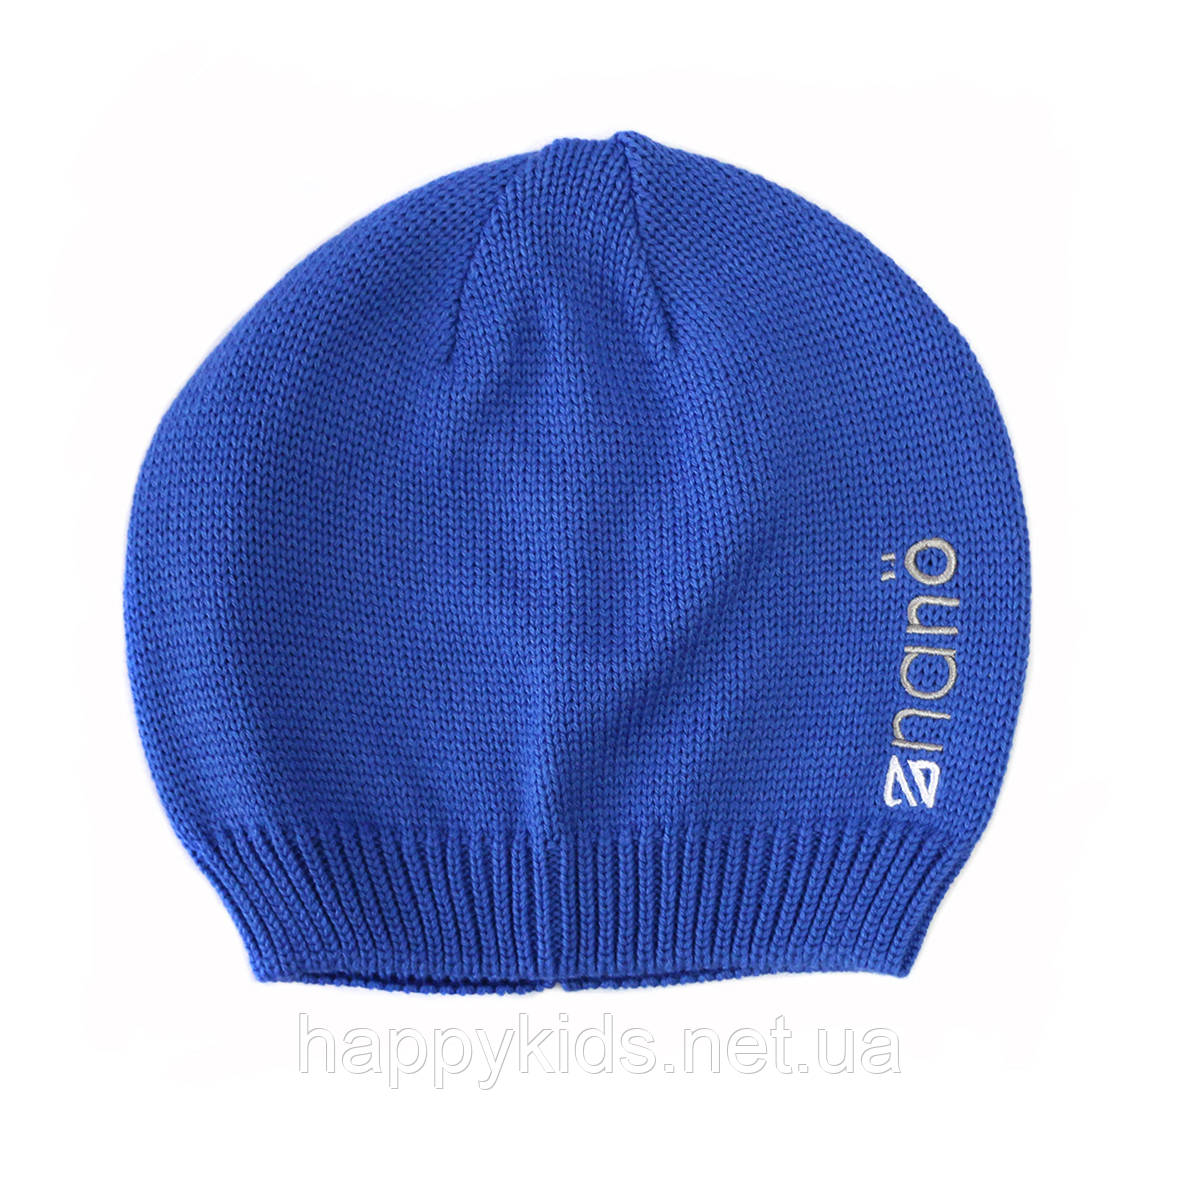 Демисезонная шапка  для мальчика  NANO 200 BTUT S17 Classical. Р-р  2/4х - 7/12.